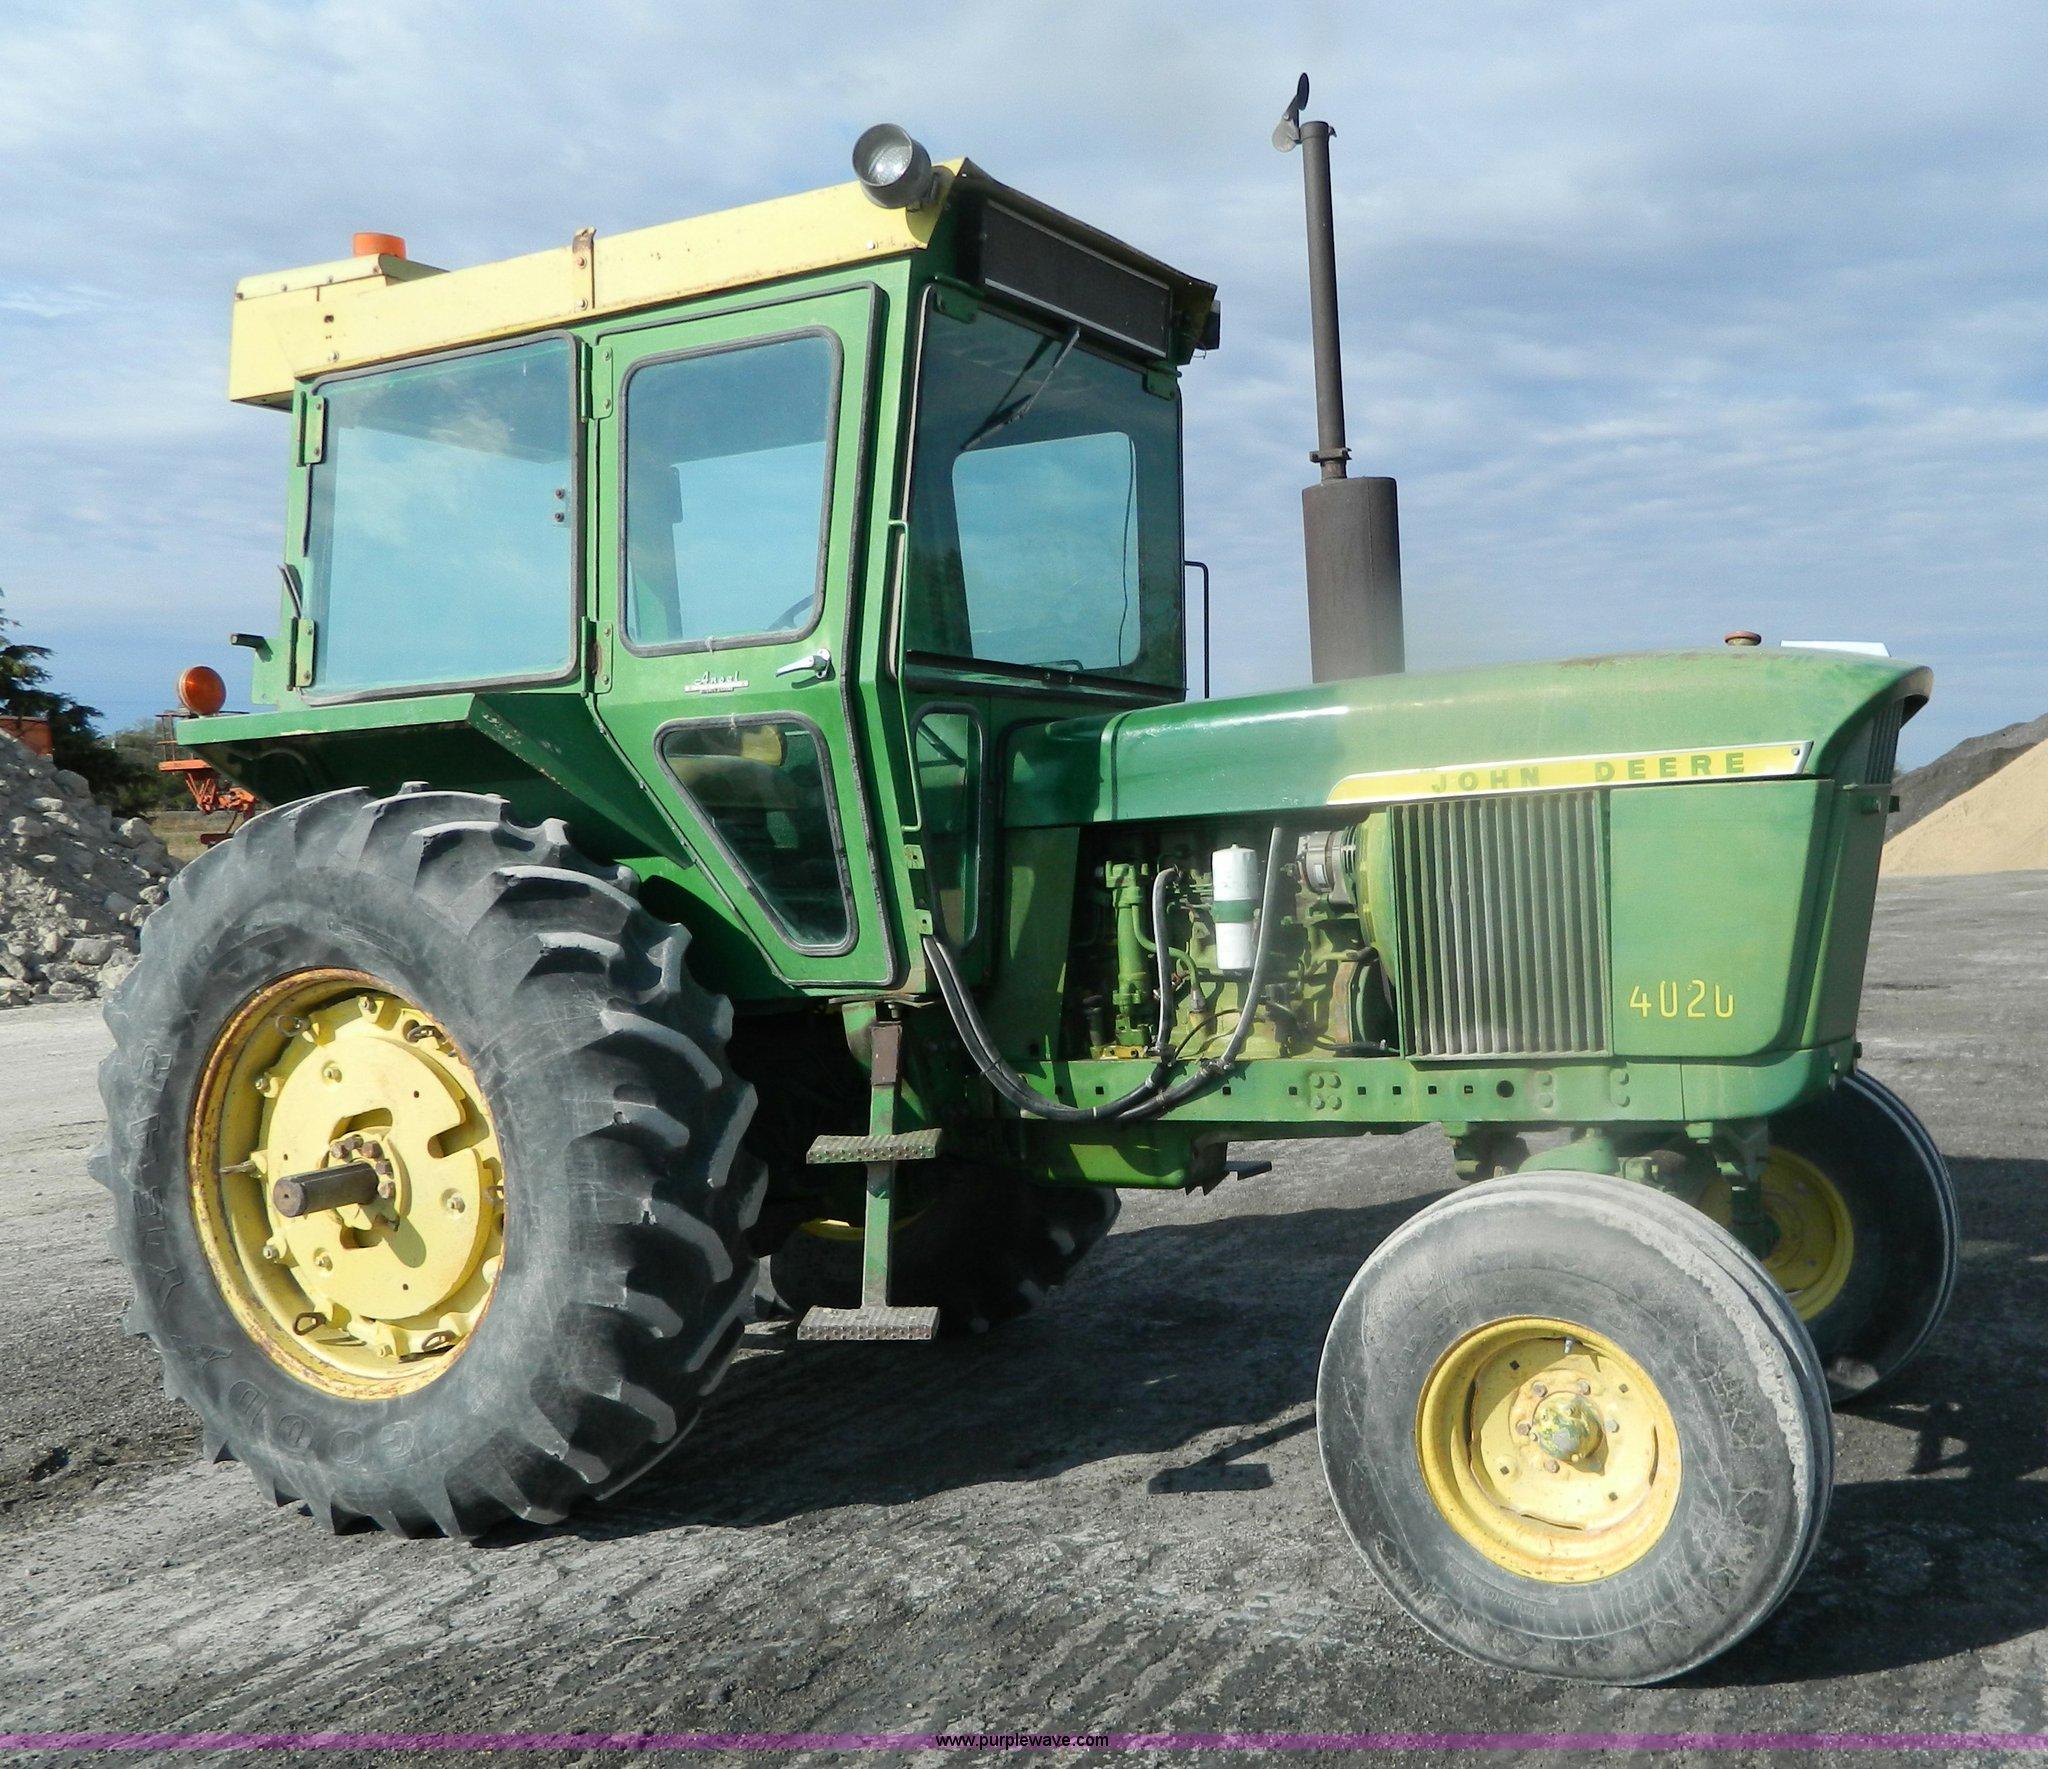 BT9916 image for item BT9916 1969 John Deere 4020 tractor